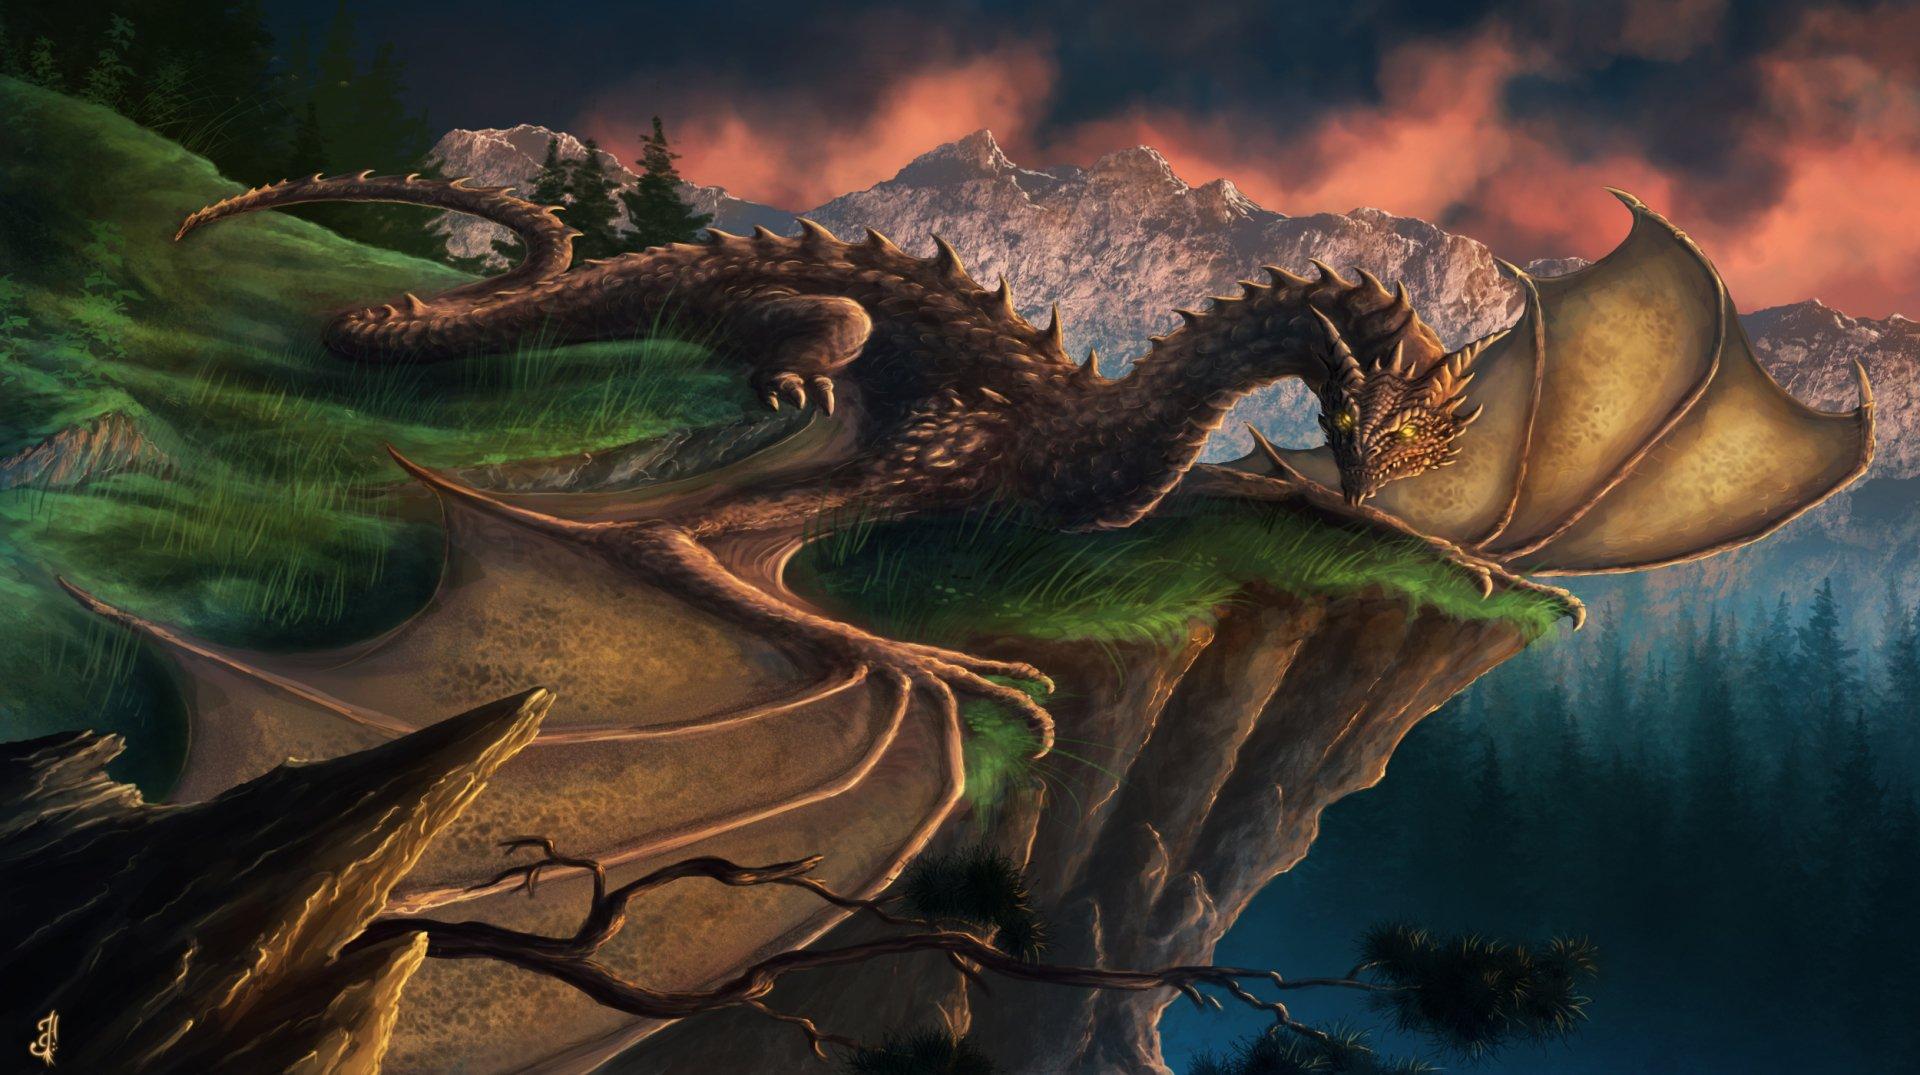 Dragon HD Wallpaper   Background Image   2500x1400   ID ...